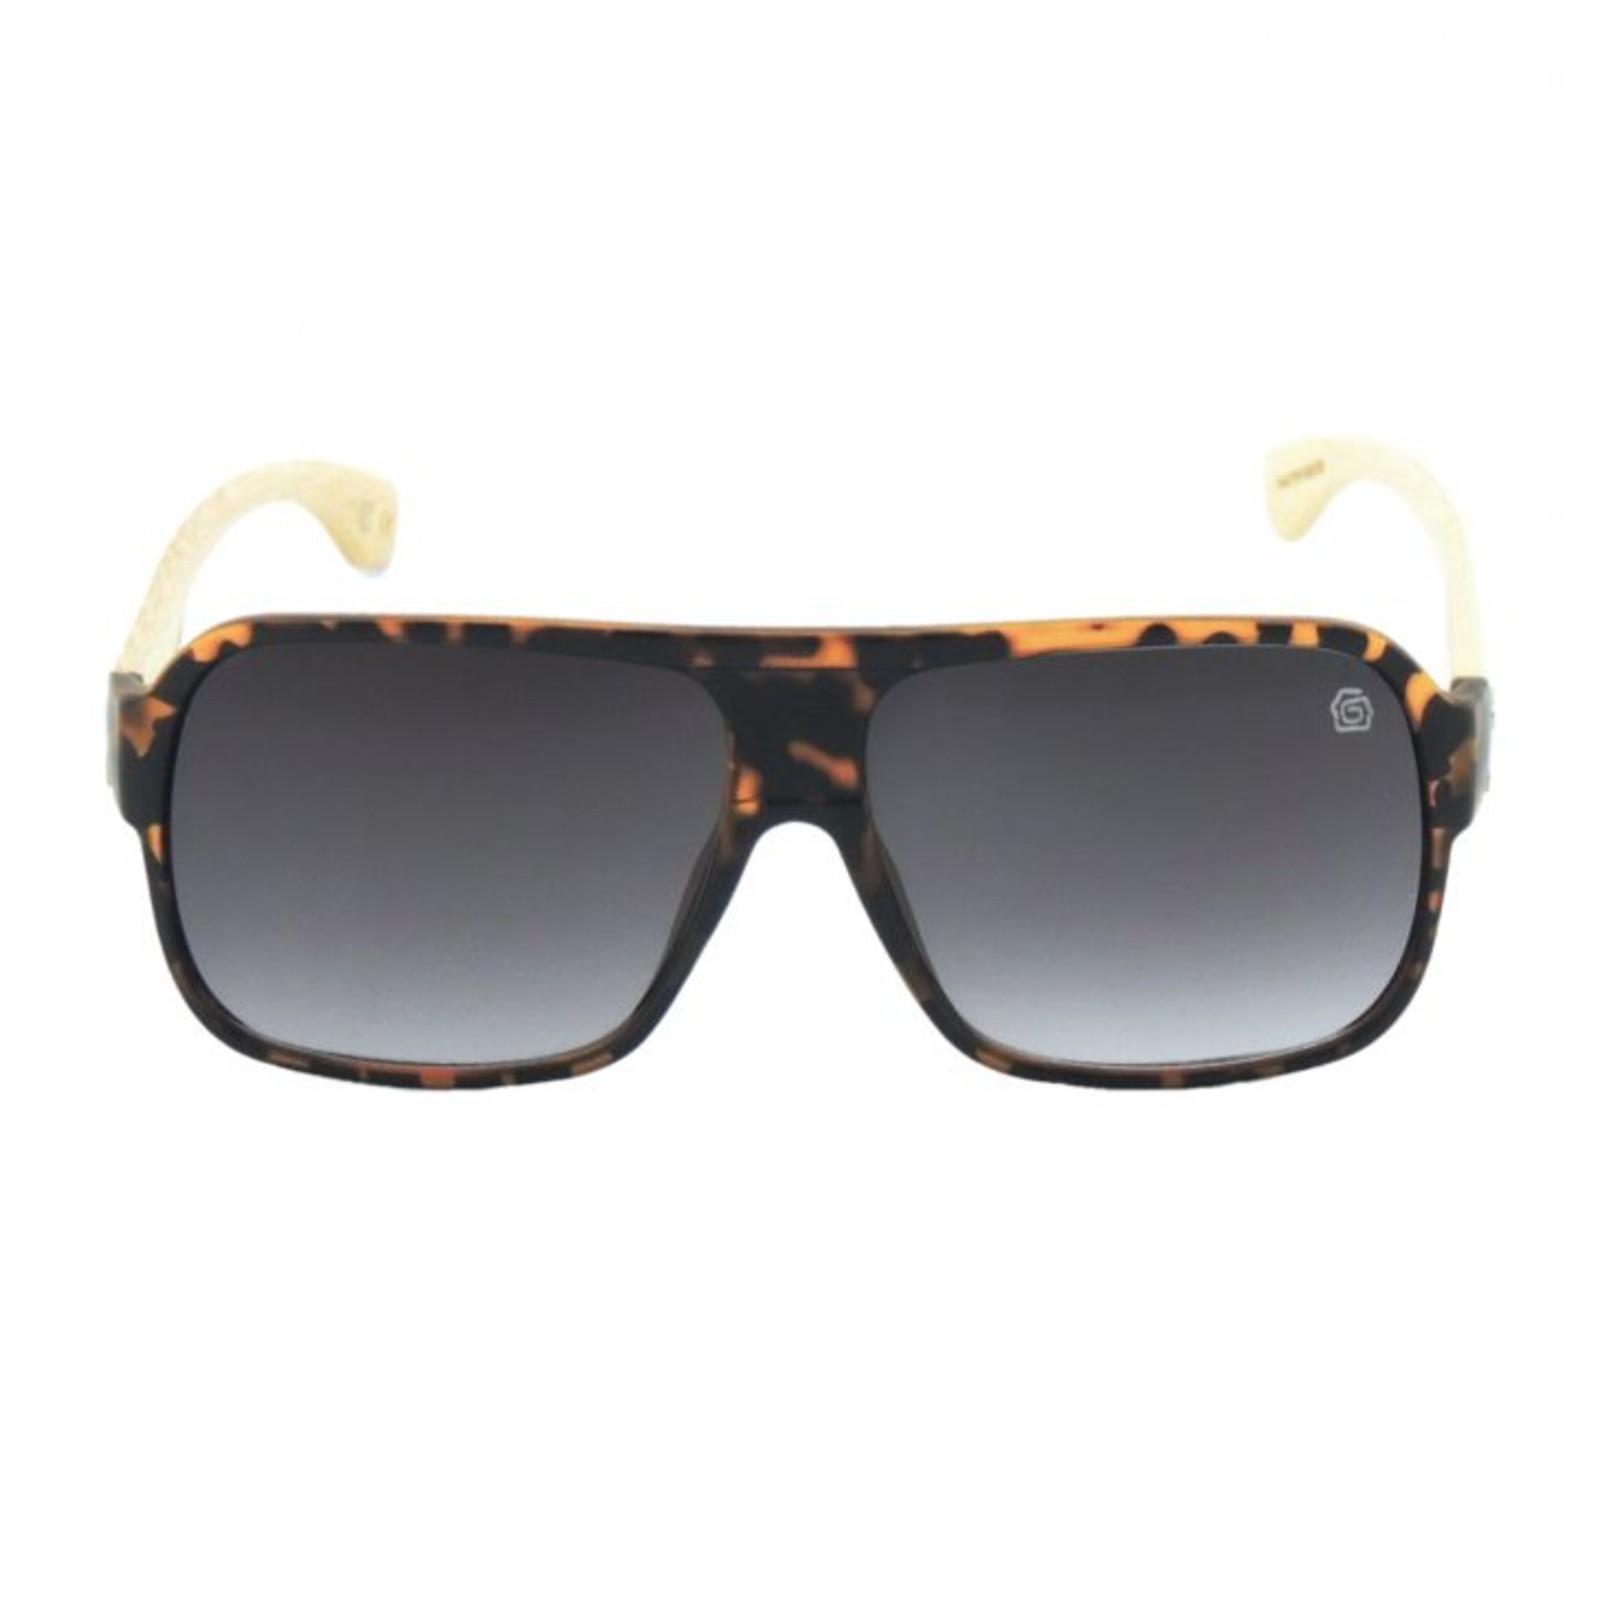 ec0b17e89e5fe ... Óculos de Sol Masculino GUGA KUERTEN Bambu Marrom Master GK95.2 ...